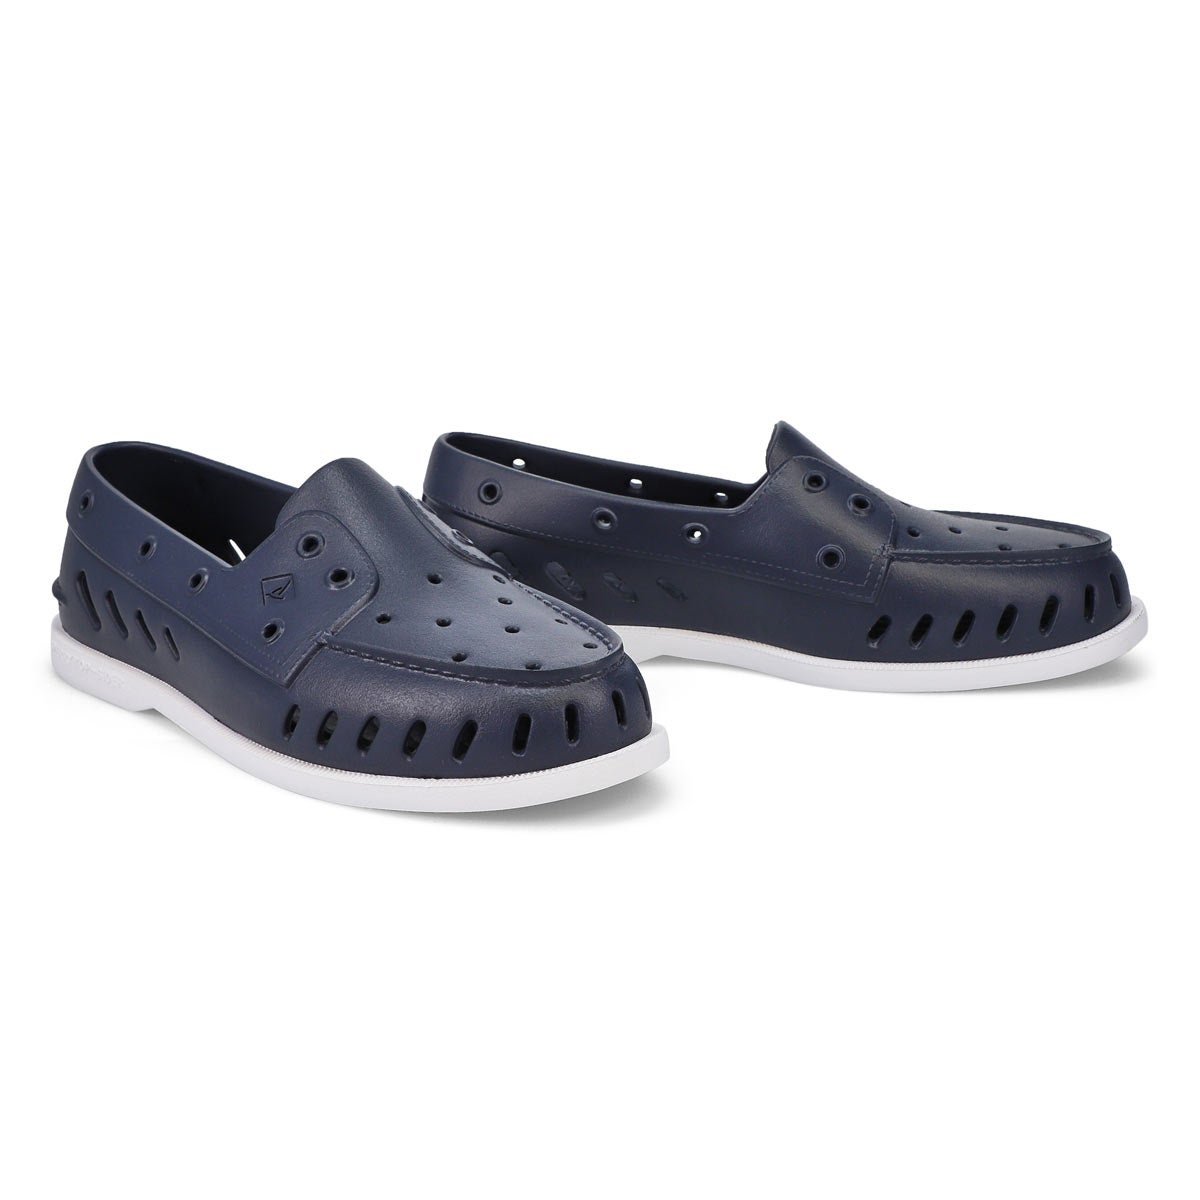 Chaussure bateau AO Float marine homme